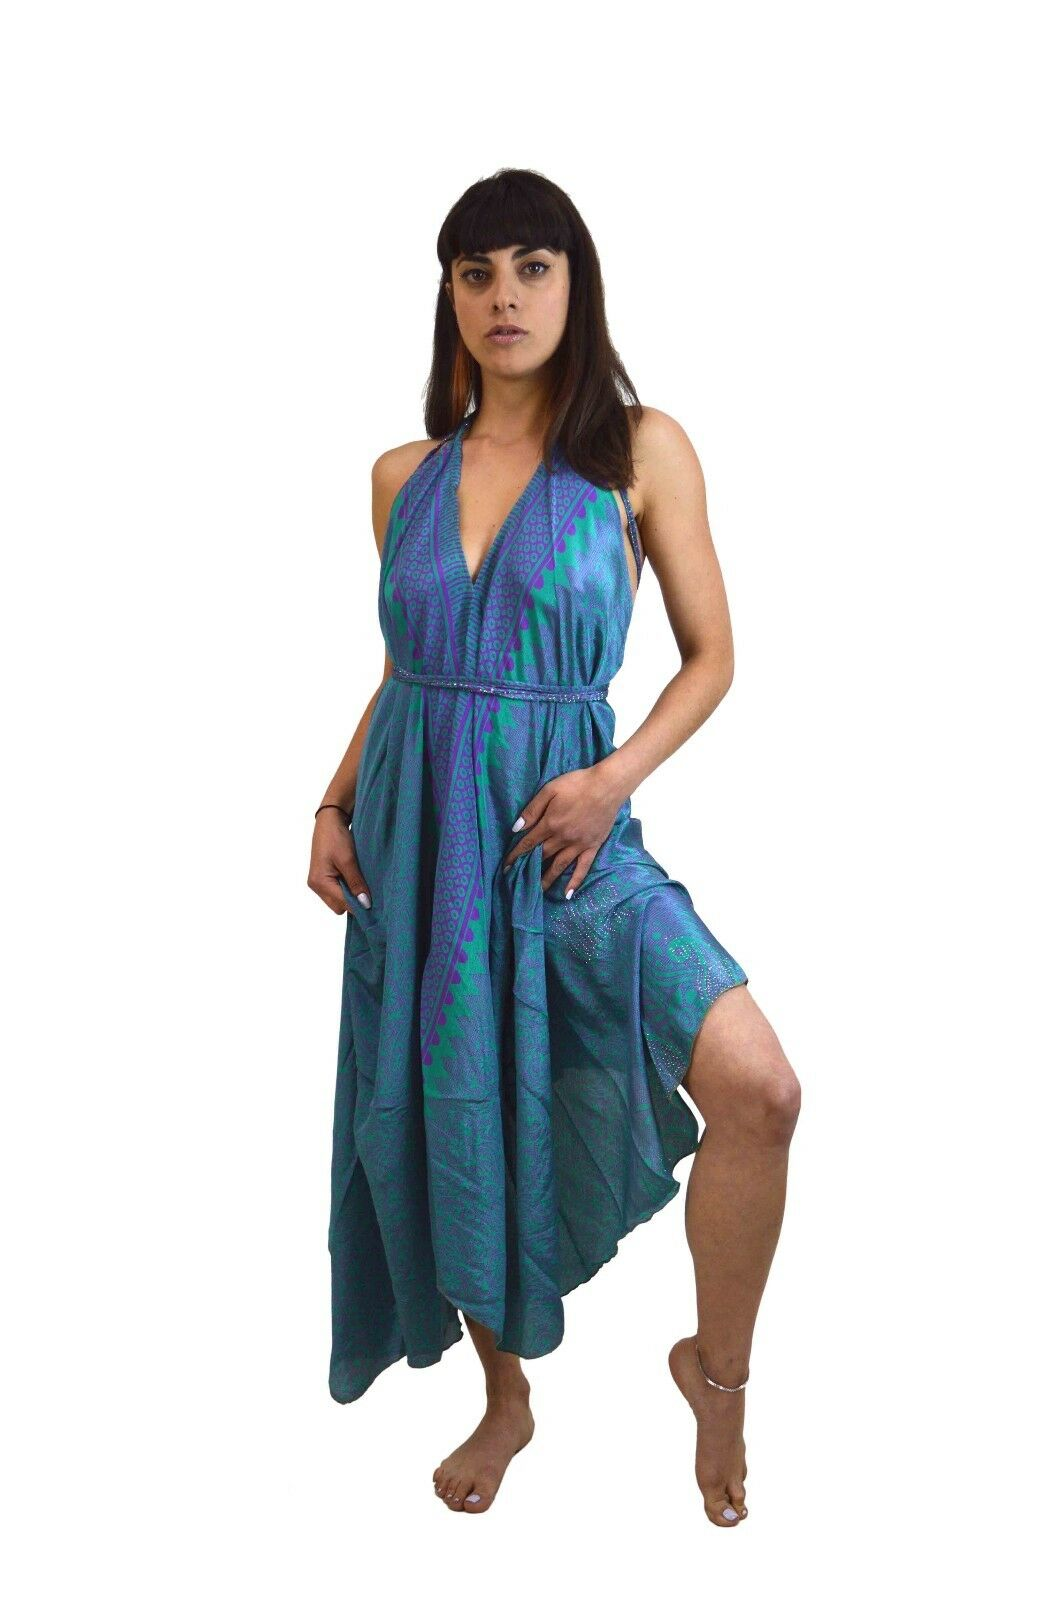 BOHO GYPSY DRESS Gypsy dress long beach dress Asymmetric dress FREE POST to UK